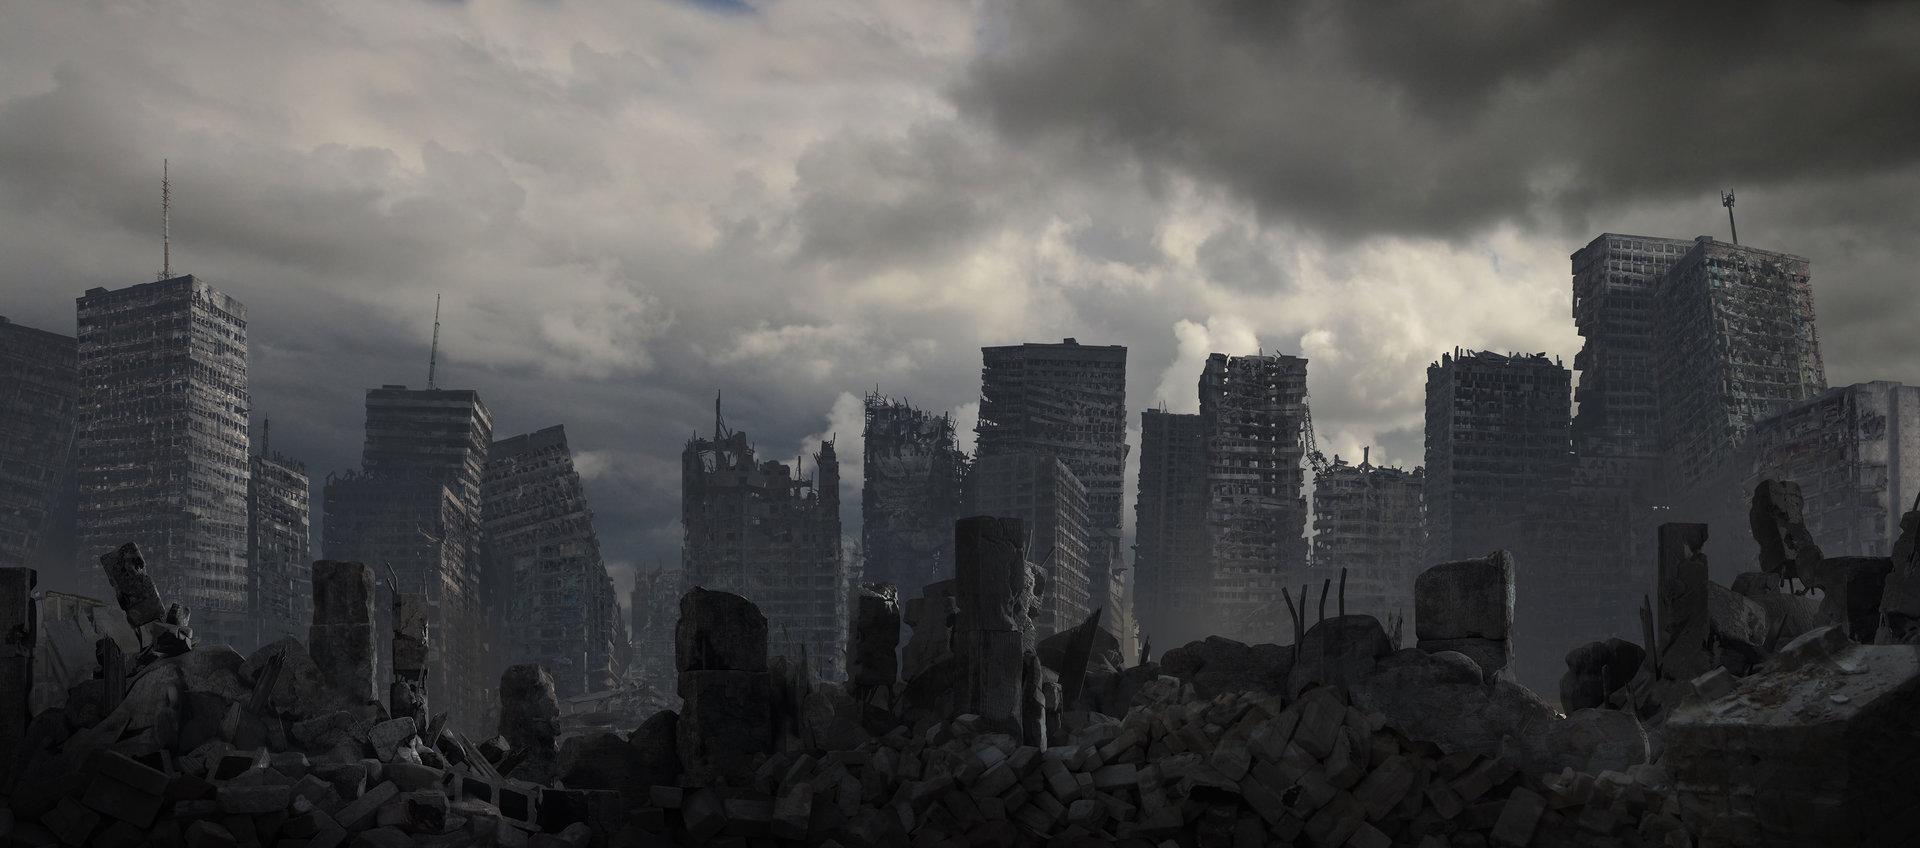 Fallout 4 concept art picture